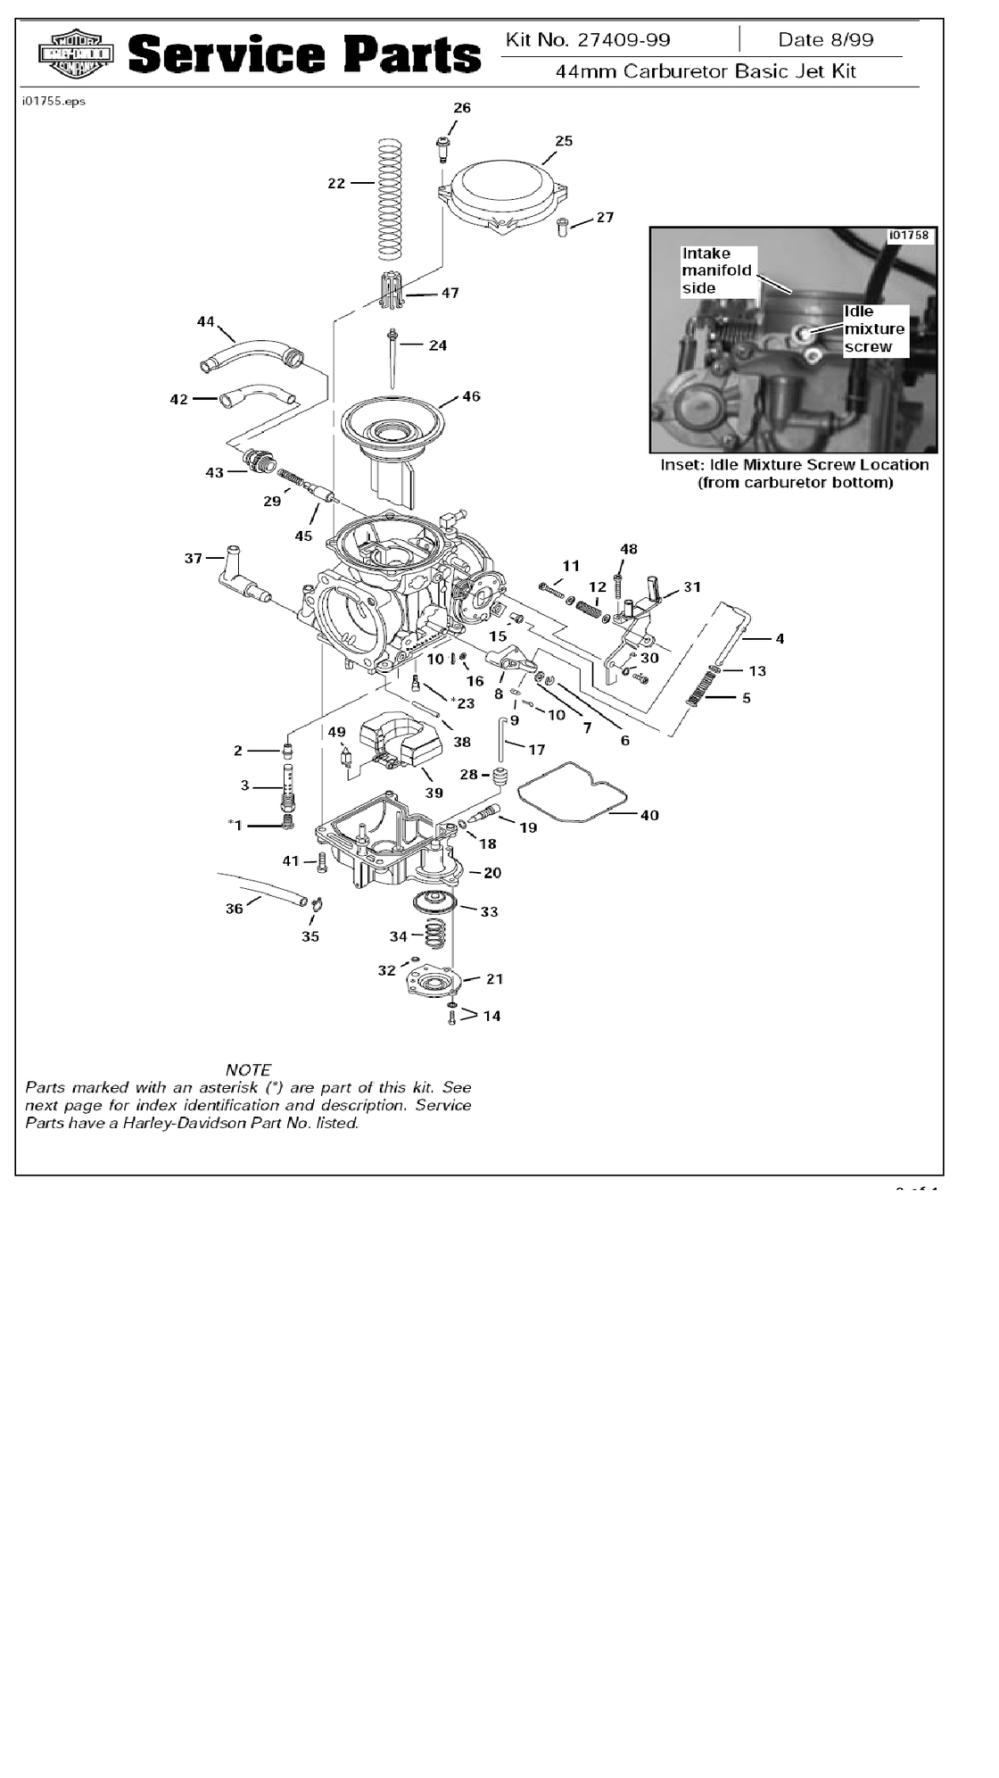 medium resolution of 1992 fatboy carburator